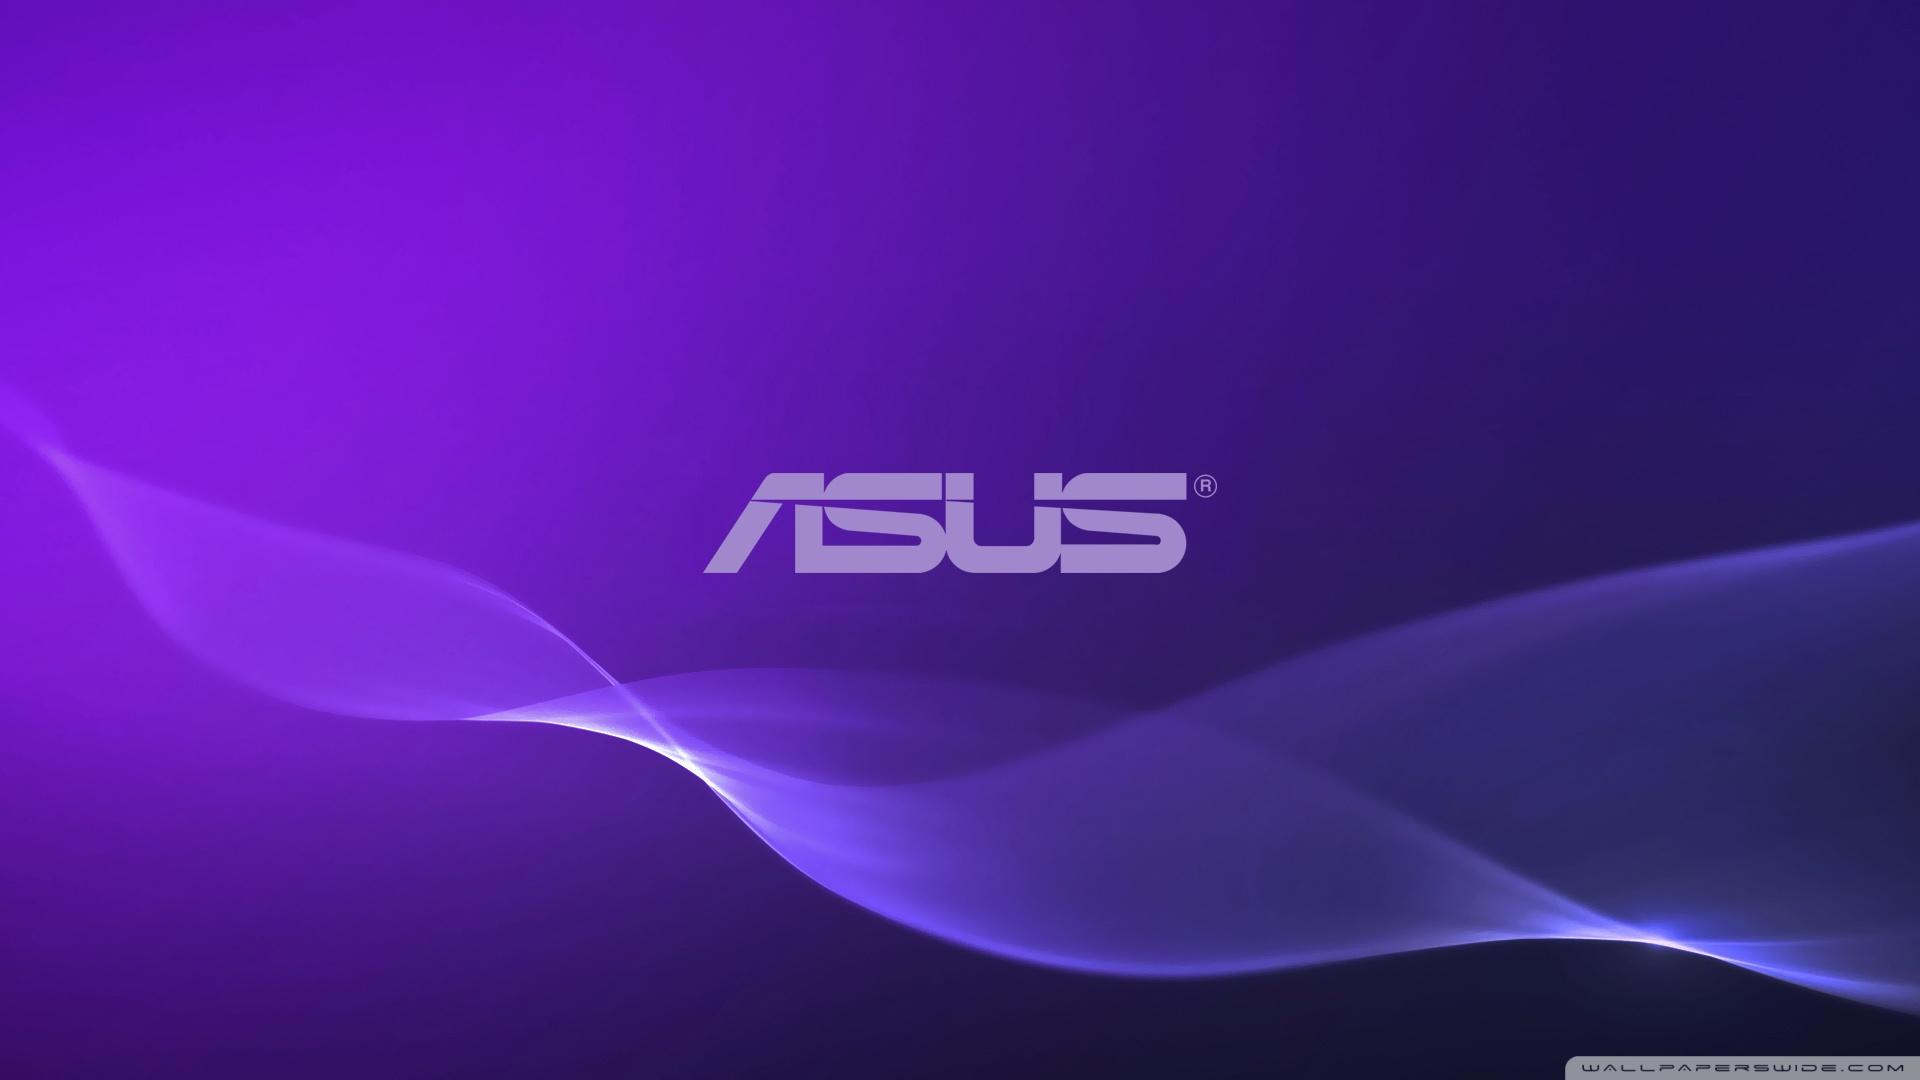 Asus Wallpaper - Asus Windows 10 Wallpaper Hd , HD Wallpaper & Backgrounds